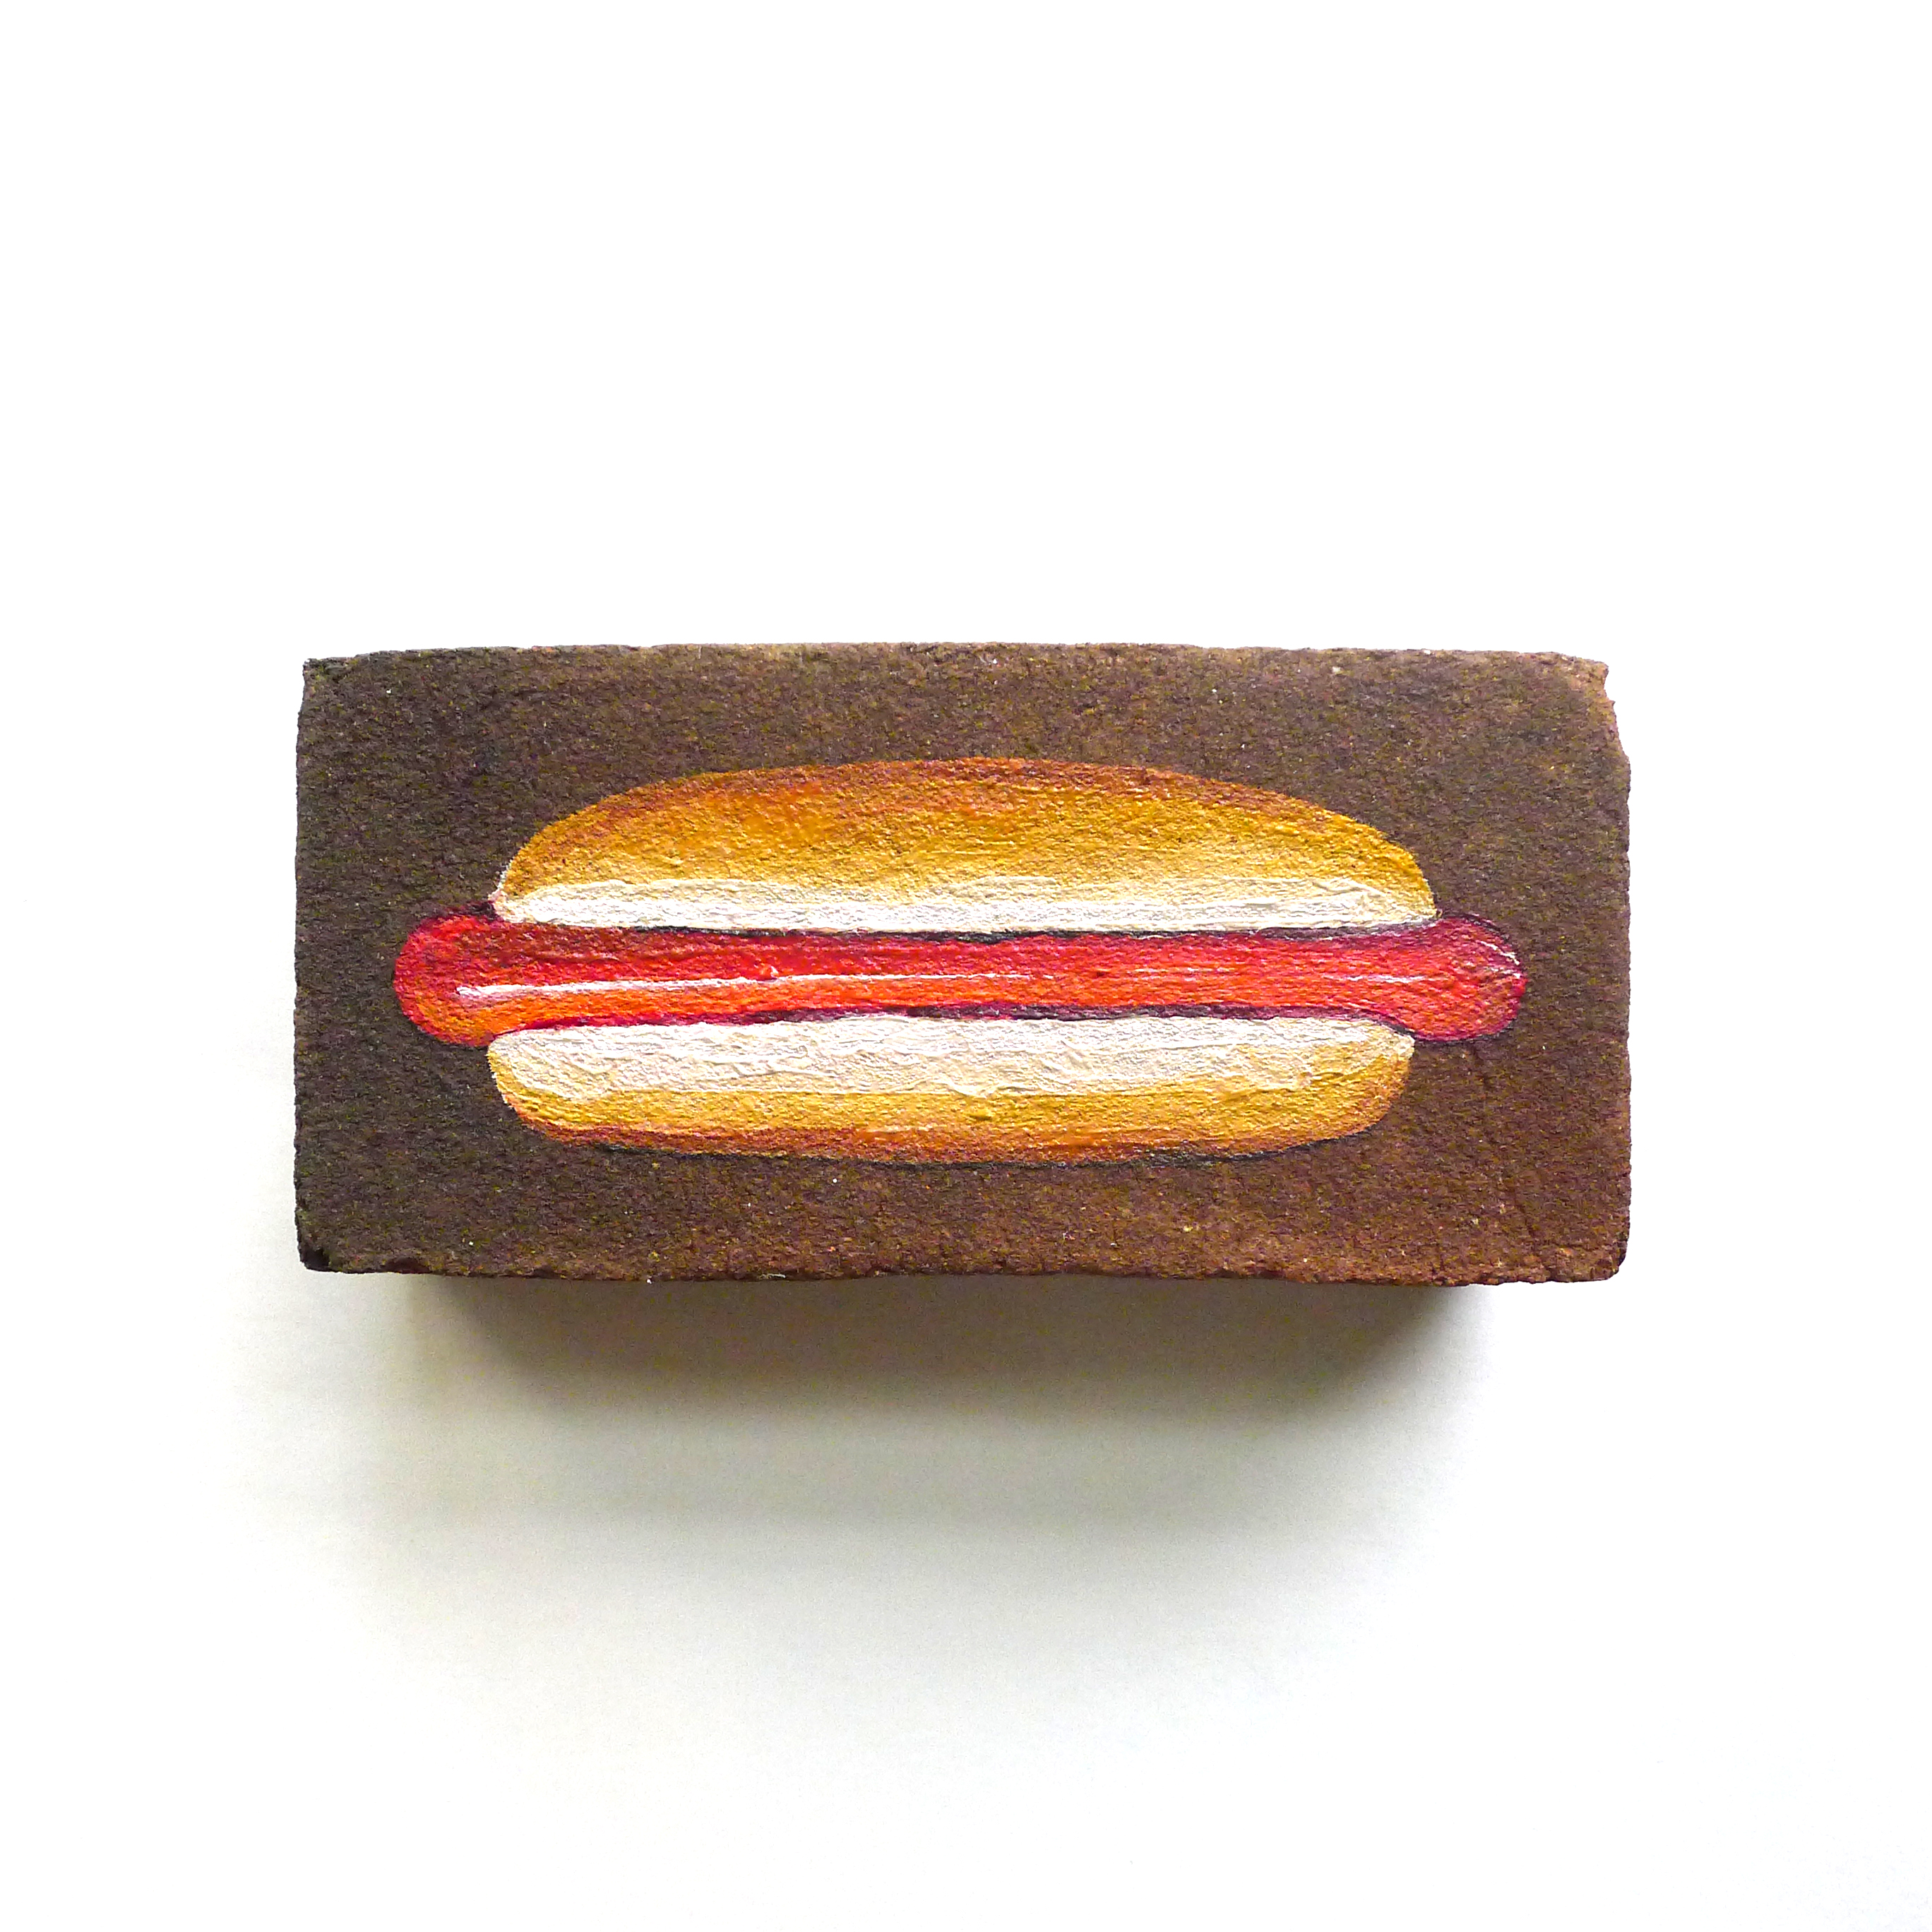 Brick by Brick #2